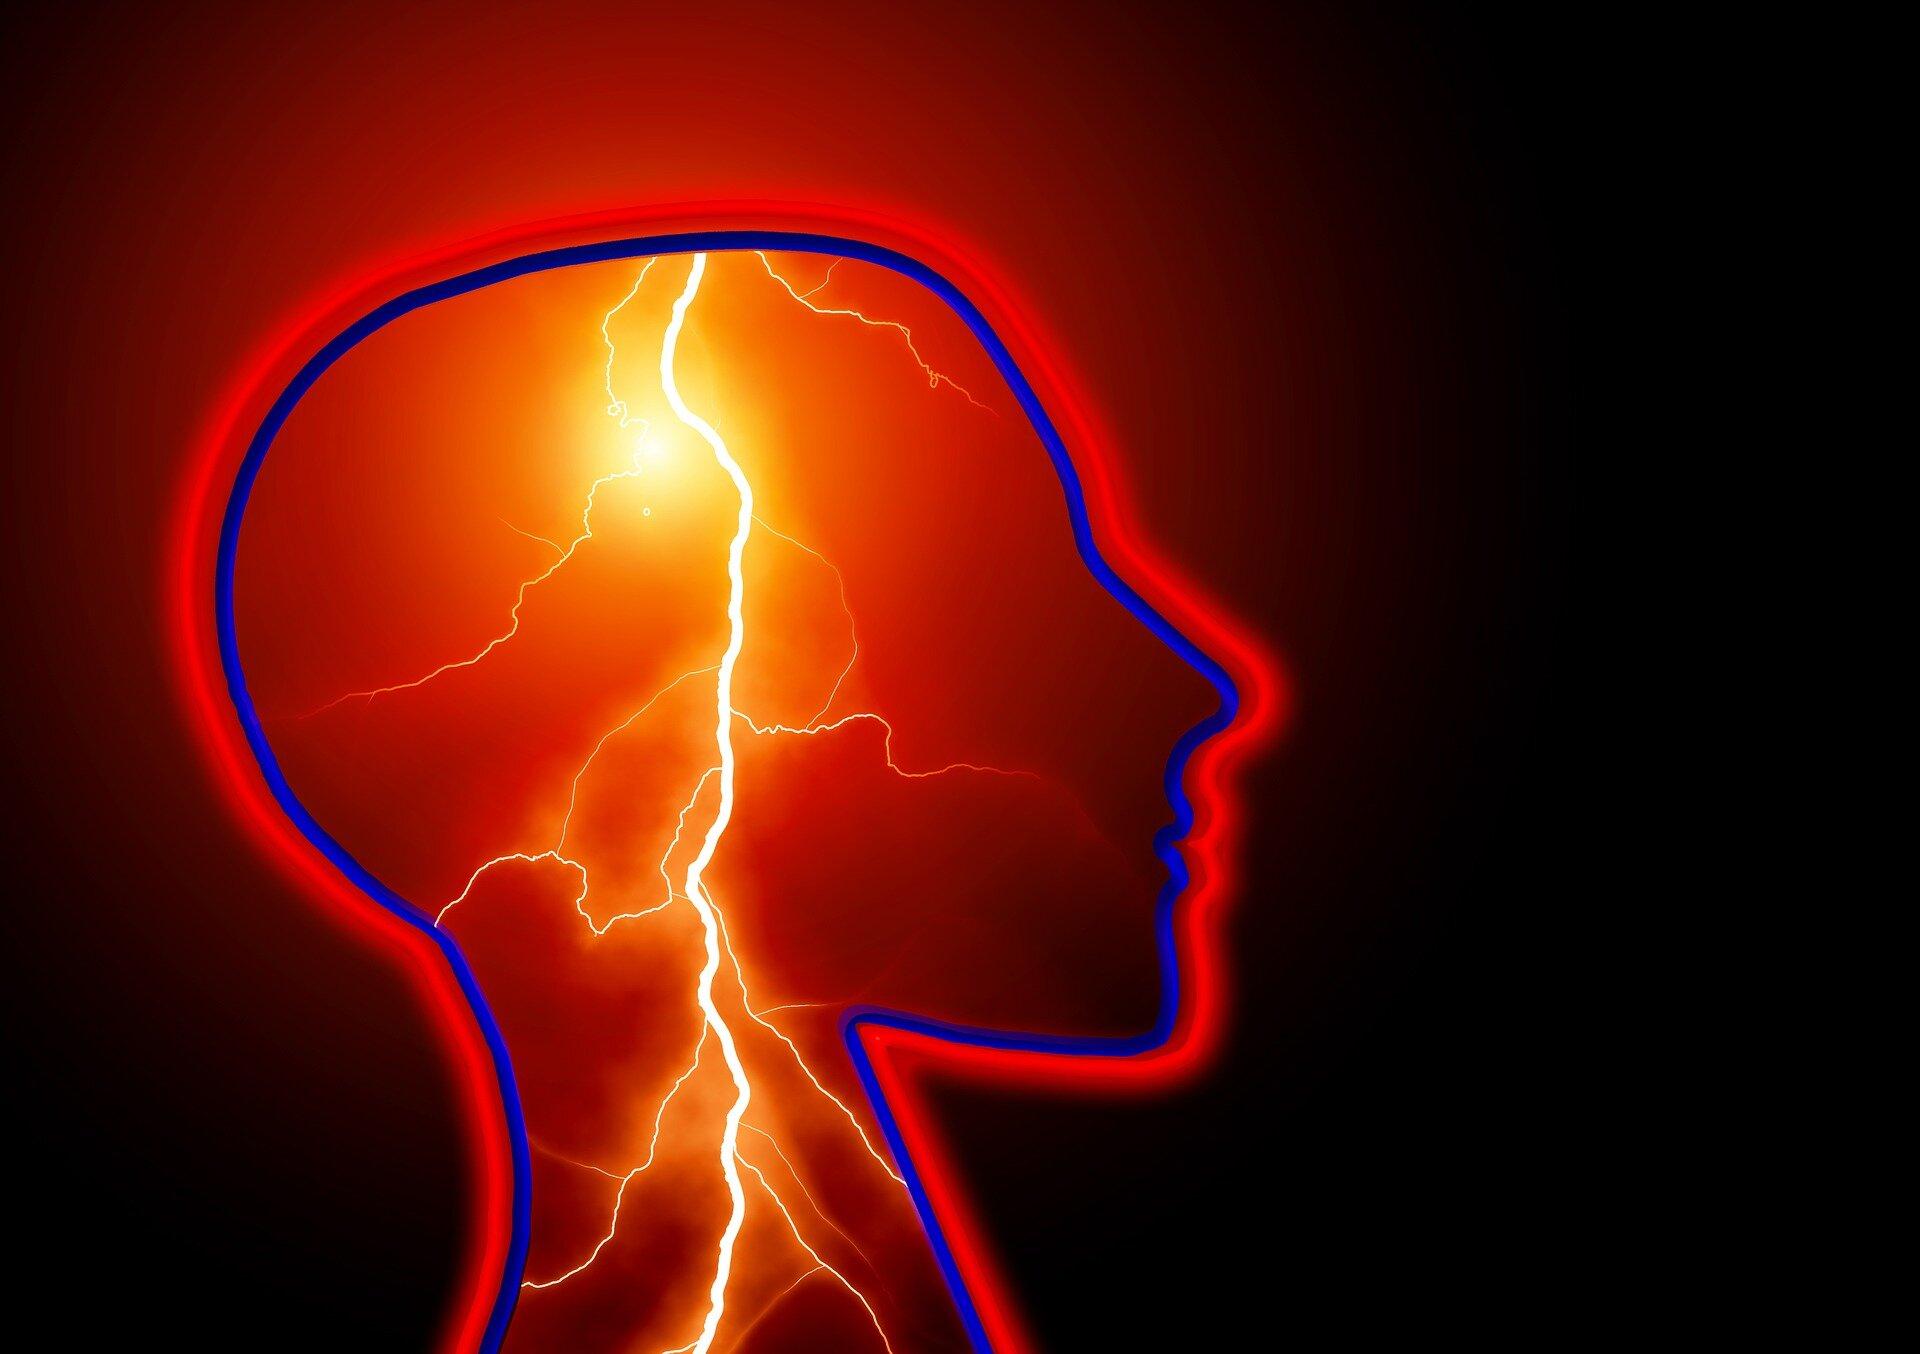 Can AI Predict Risk of Atrial Fibrillation and Stokes?